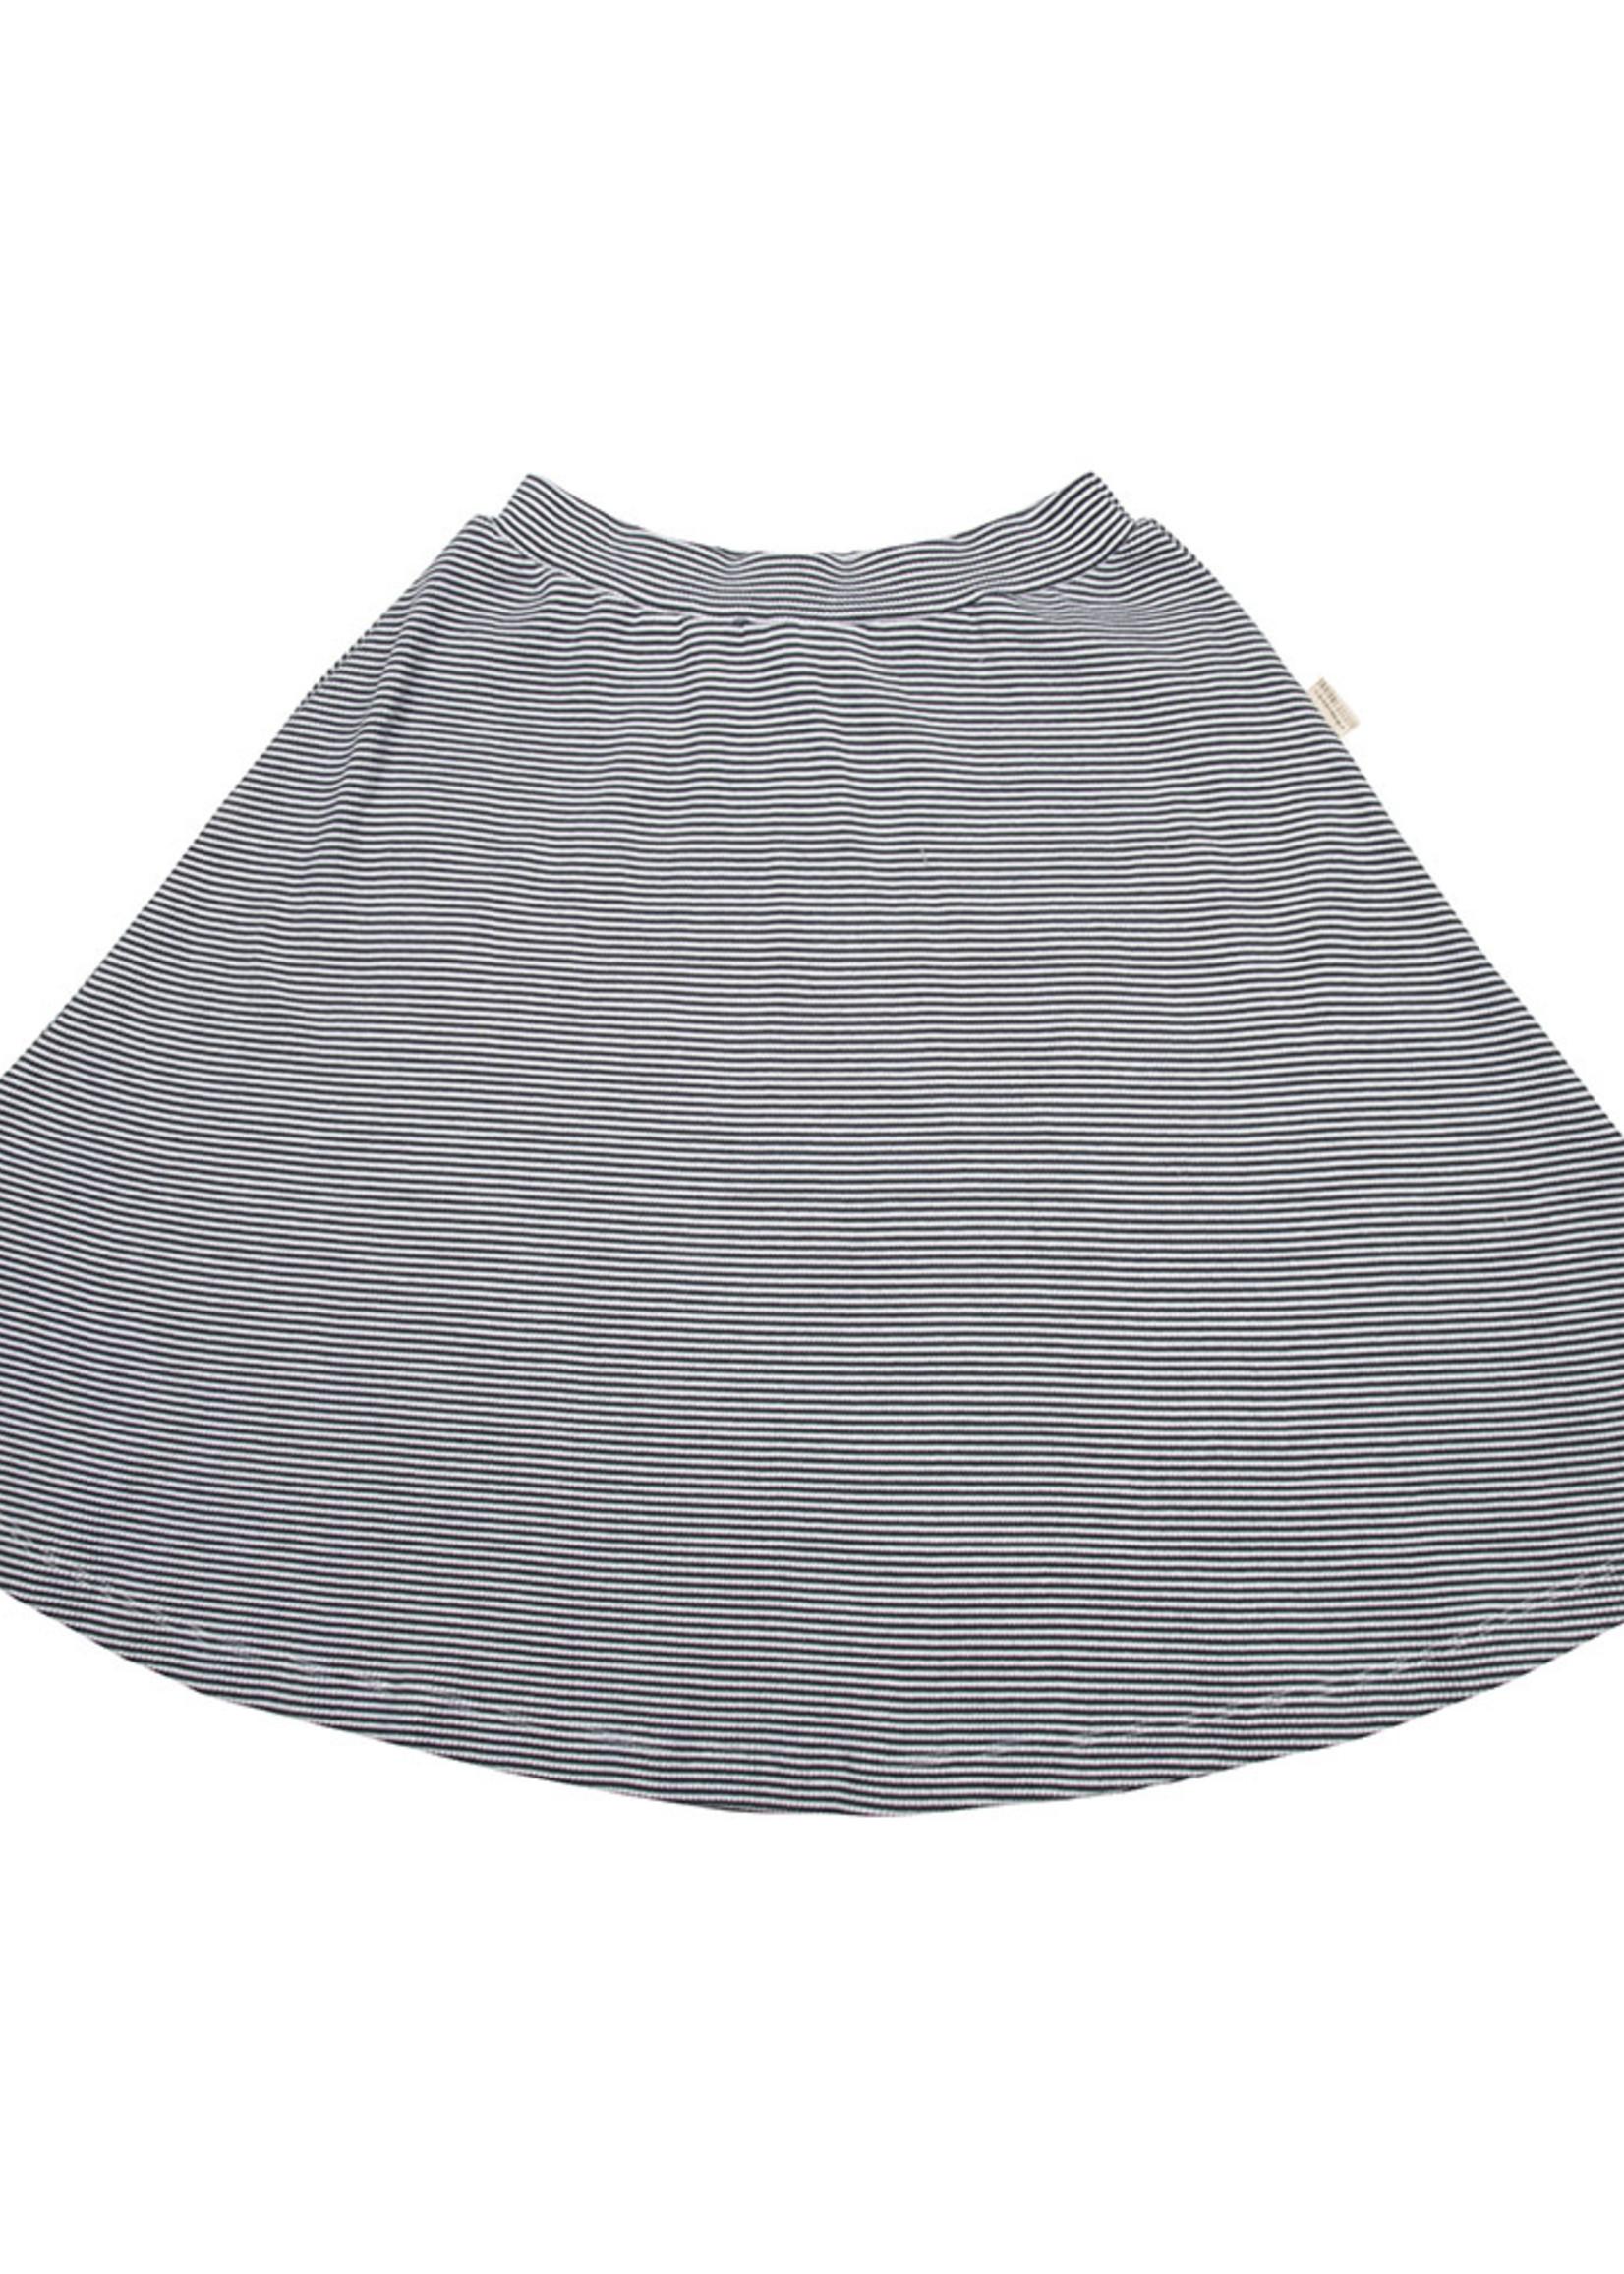 Little Indians Maxi Skirt - Small Stripe Rib